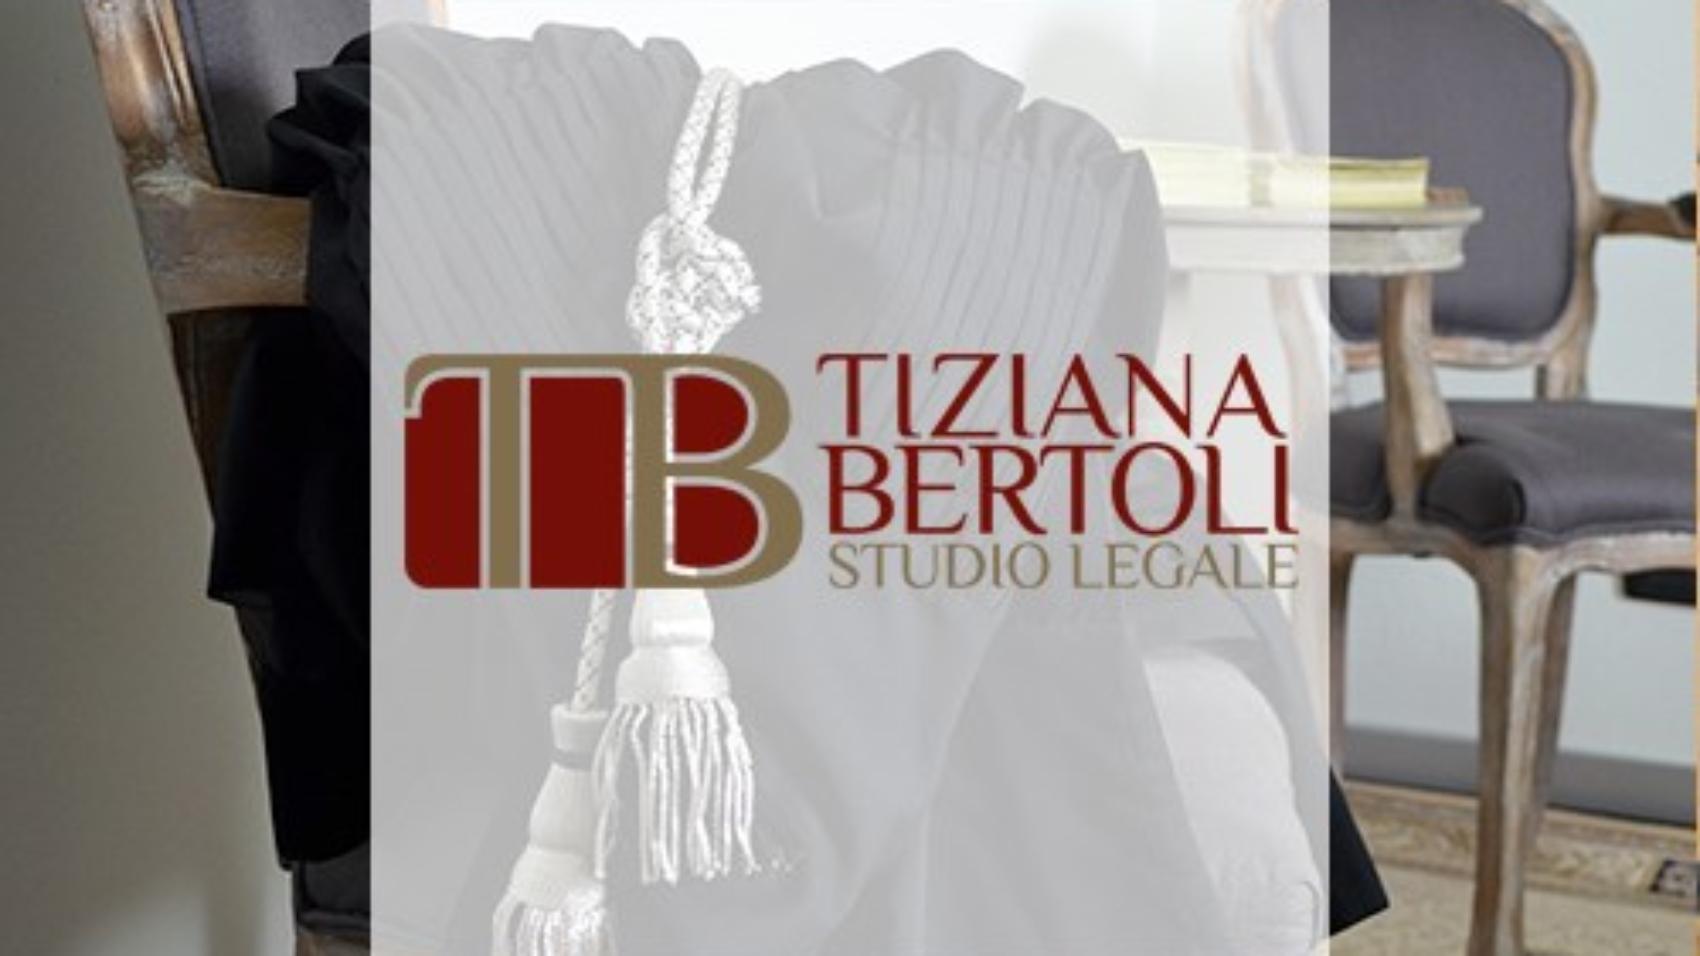 Studio legale va. Tiziana Bertoli